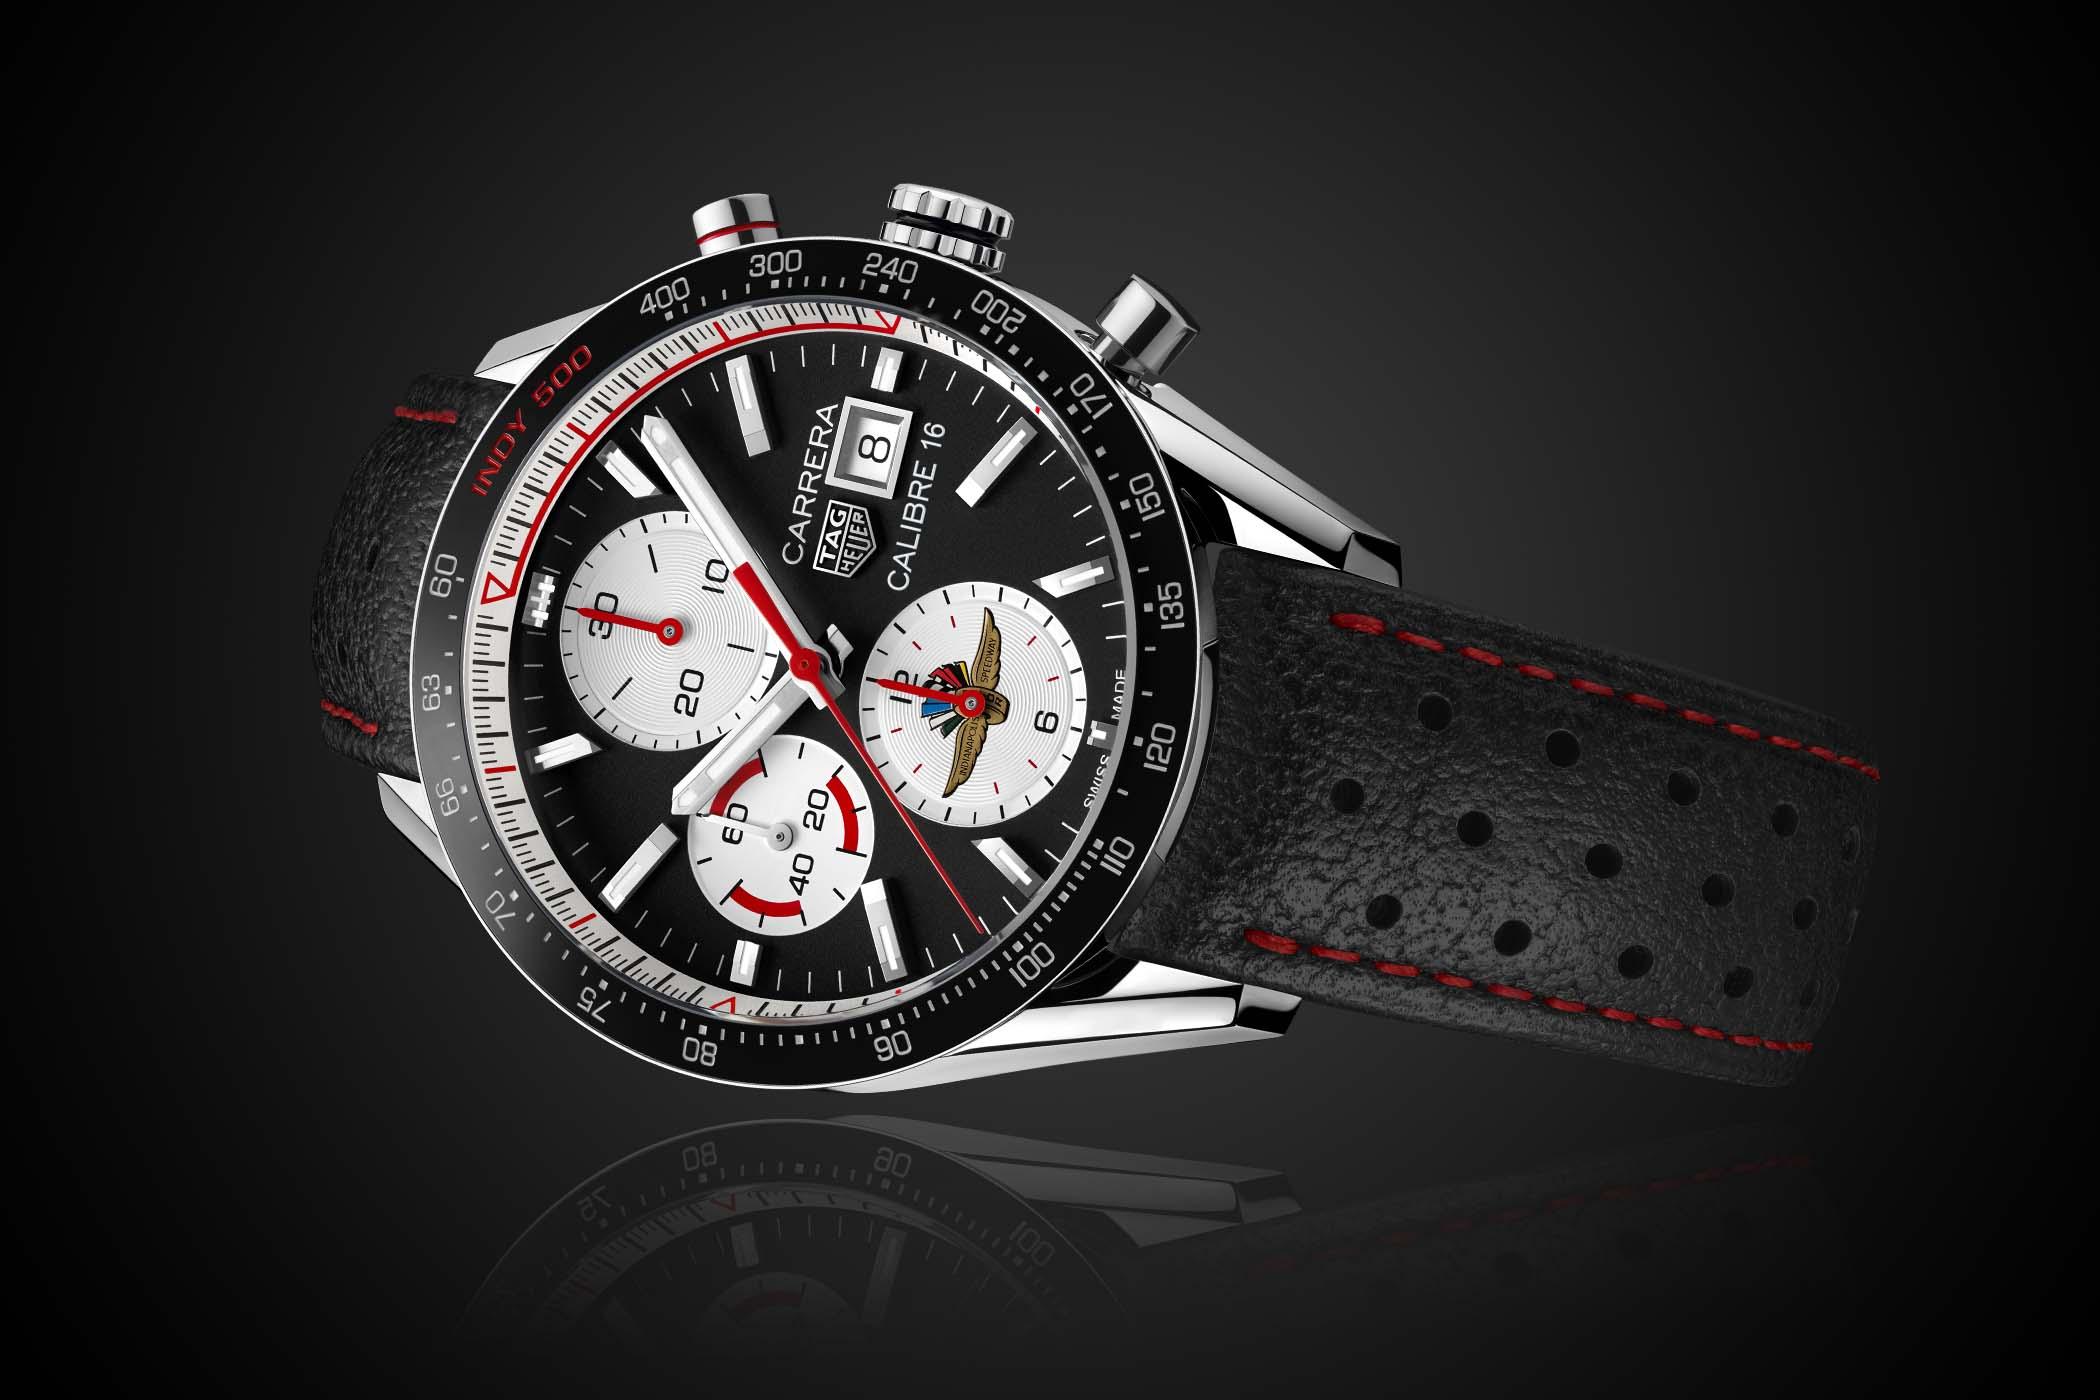 d546414bf9b TAG Heuer Carrera Replica | Best Tag Heuer Replica Watches Online Sale